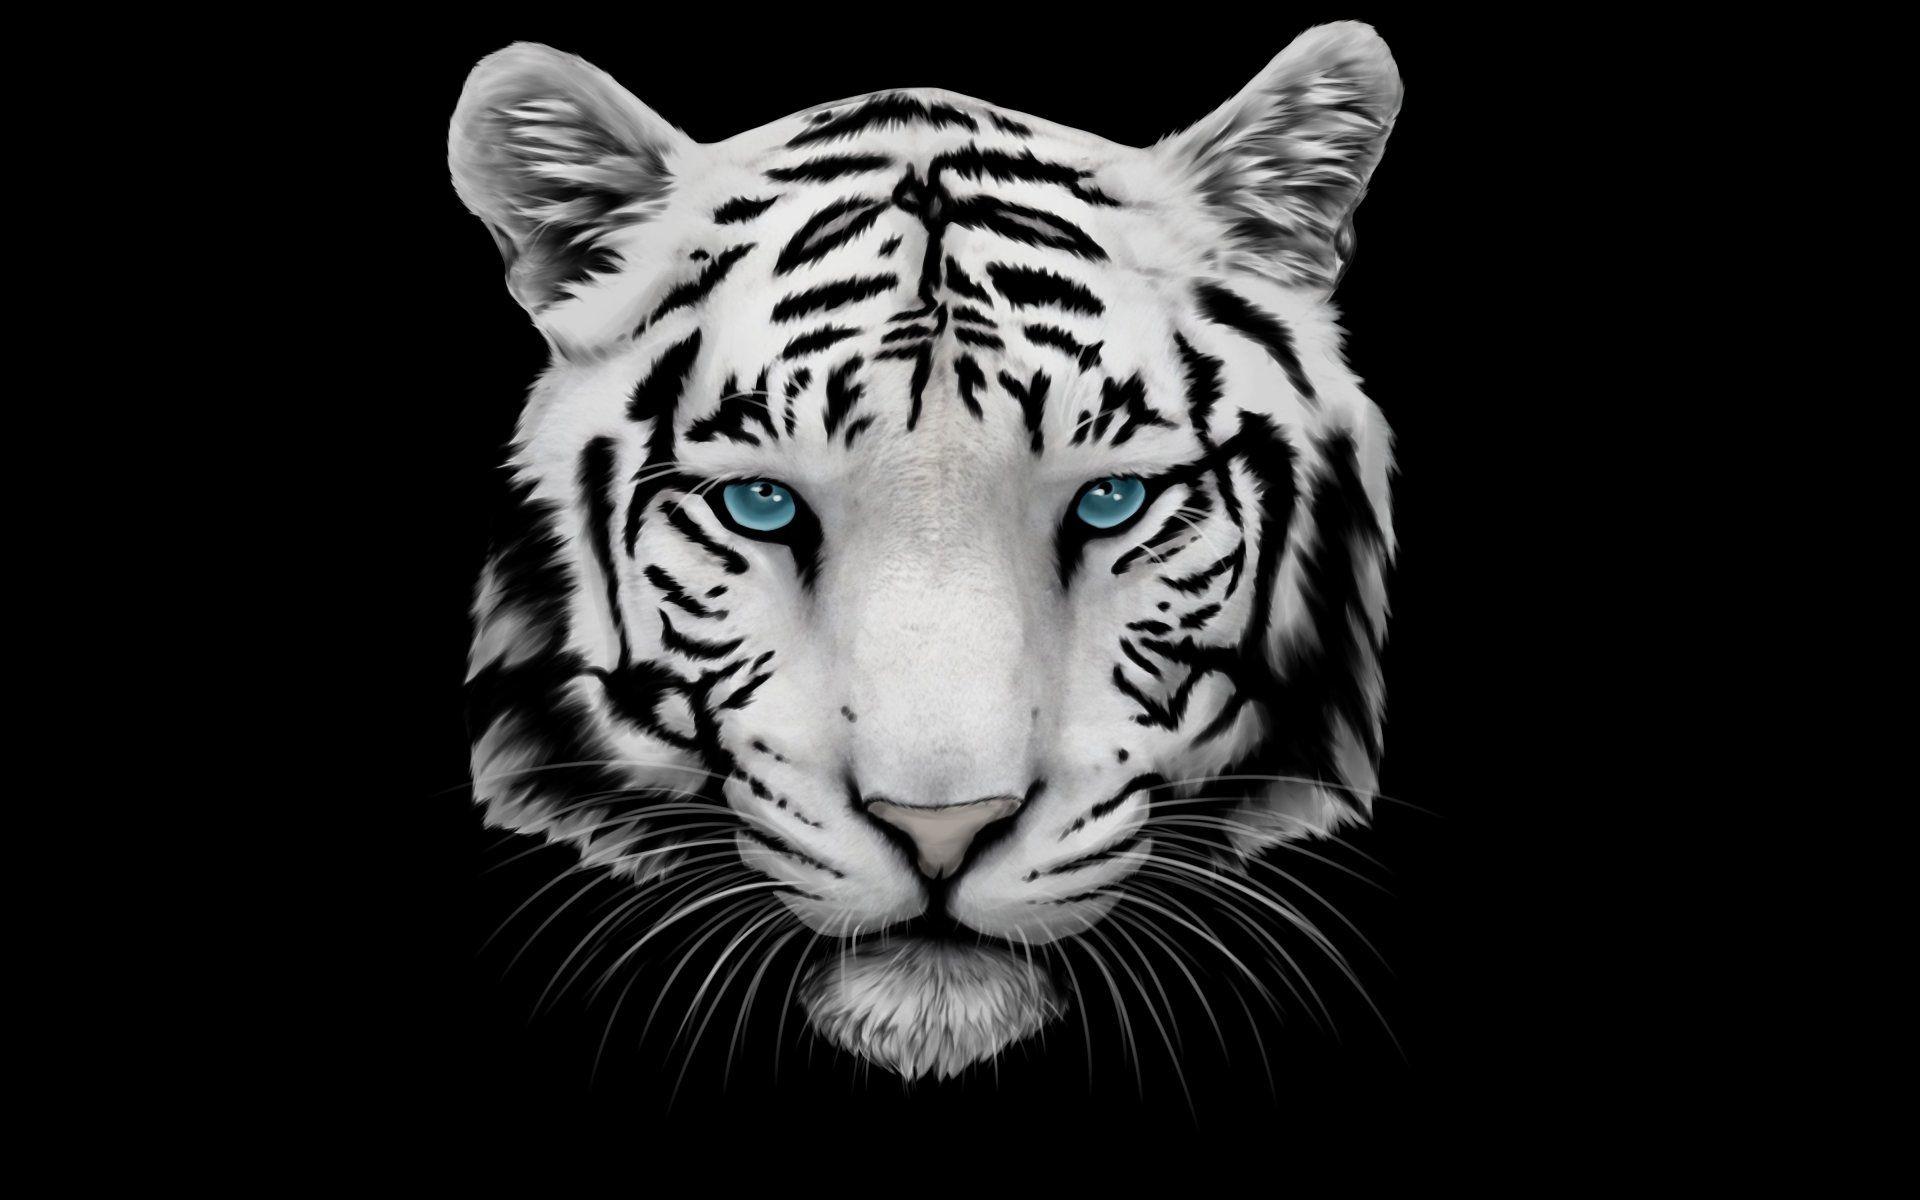 White Tiger Face, Full HD Wallpaper